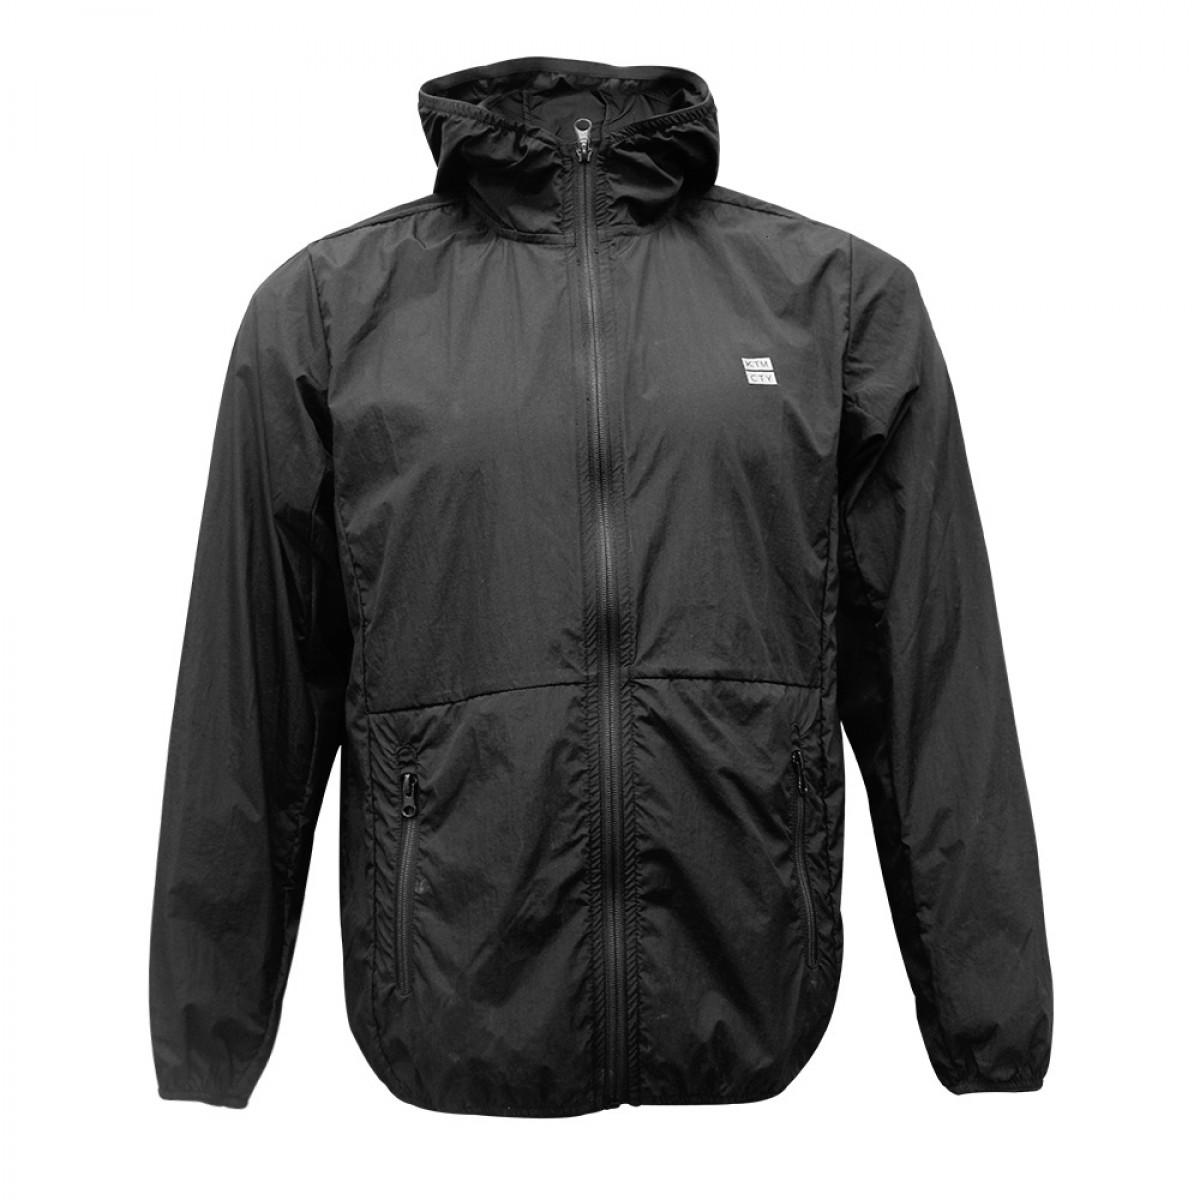 men-taffeta-windcheater-jacket-ktwj05842-8a